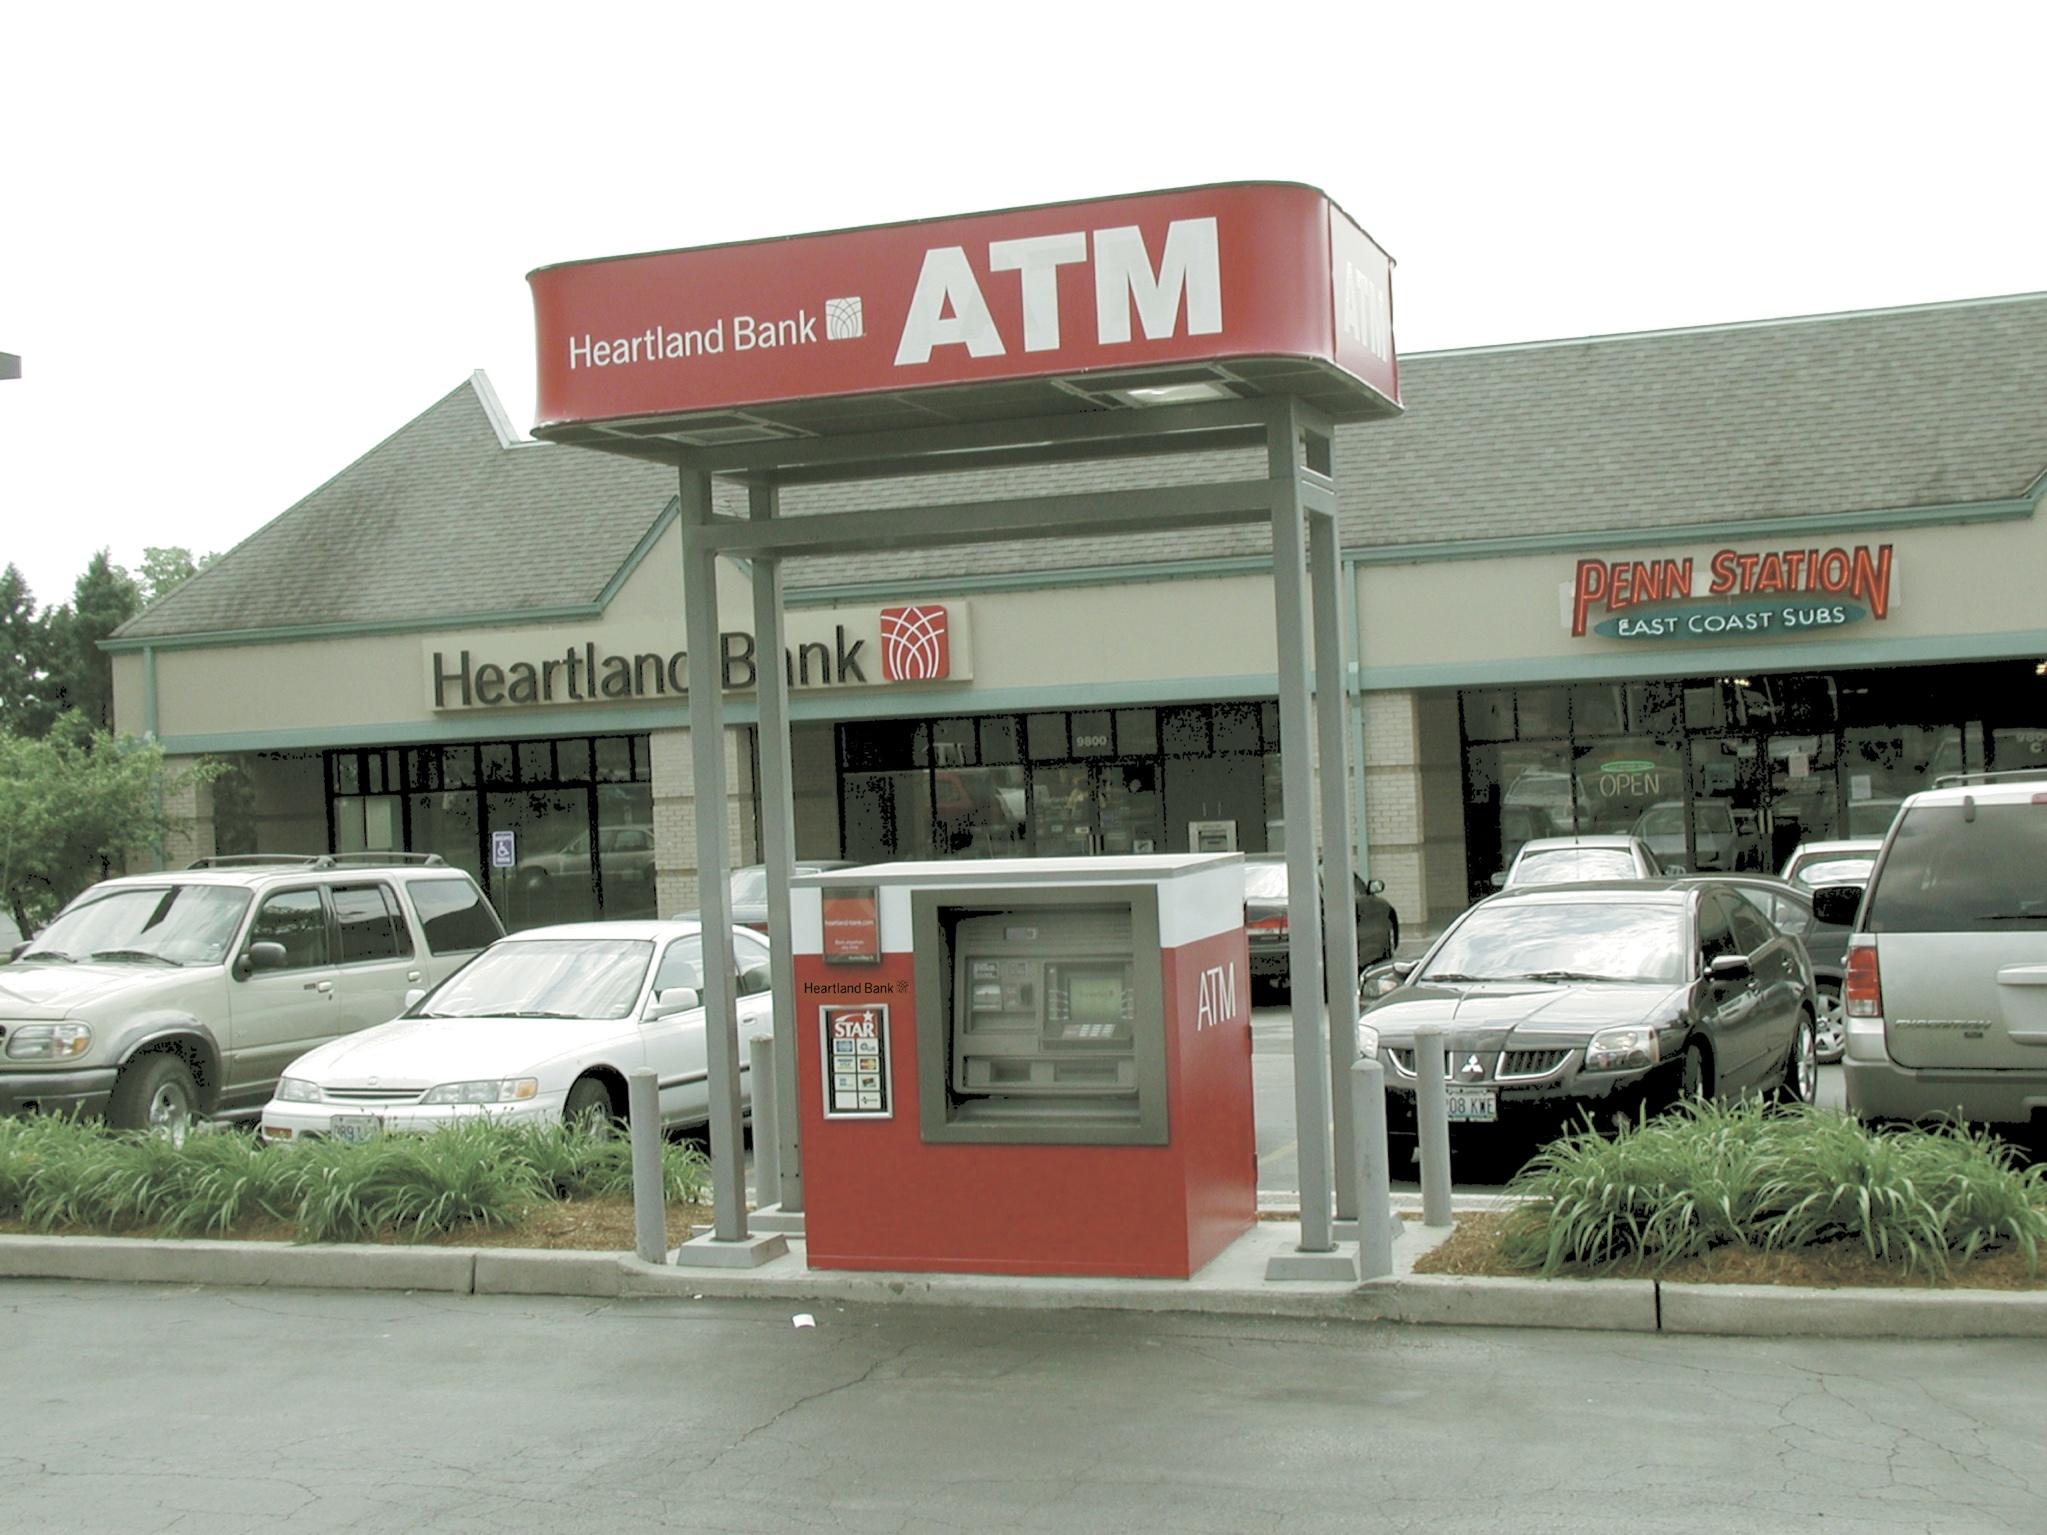 Heartland-Bank-James-Mohrmann-2012-11-274